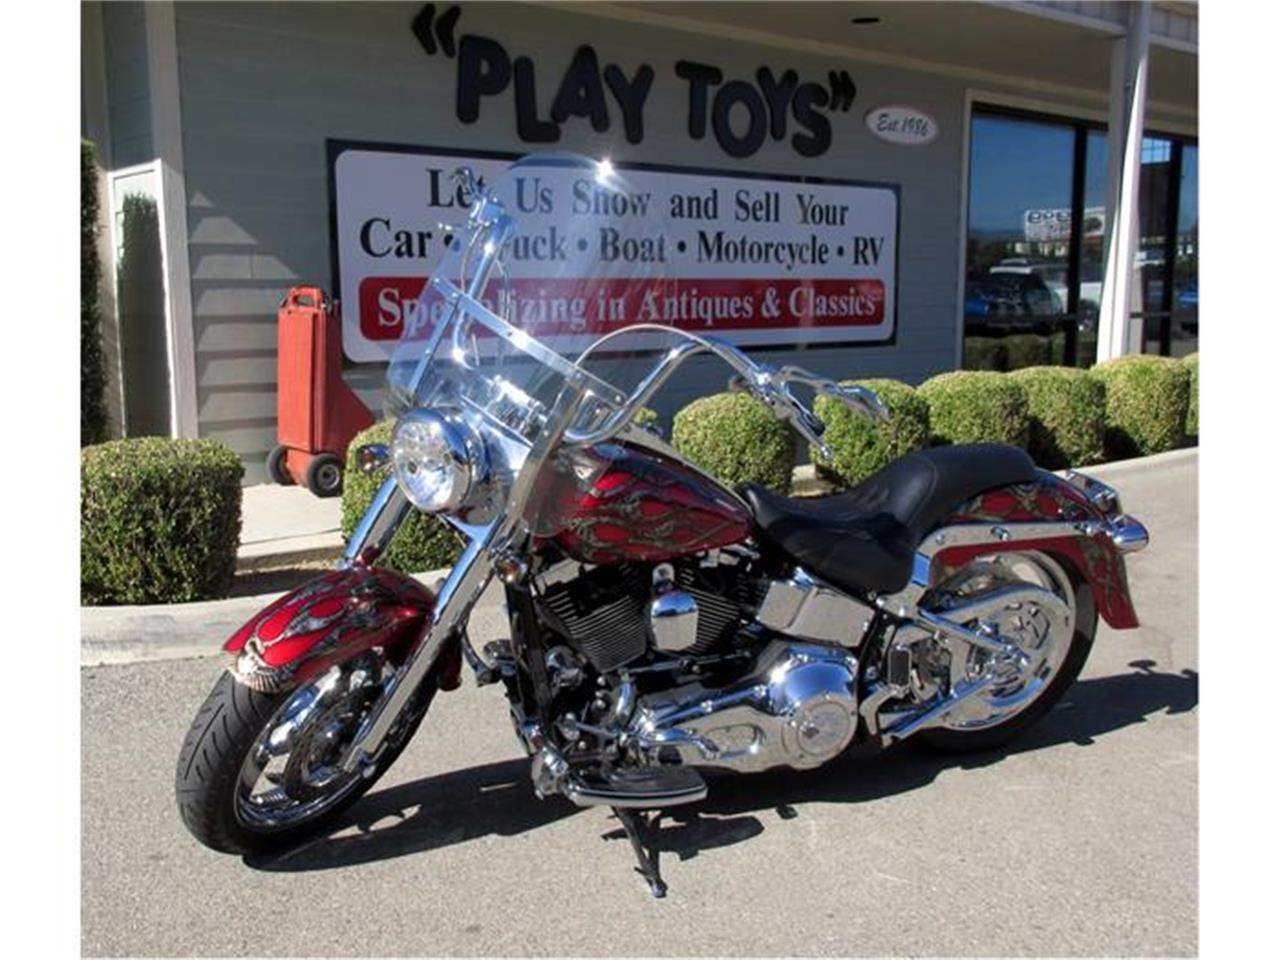 For Sale: 2005 Harley-Davidson Fat Boy in Redlands, California